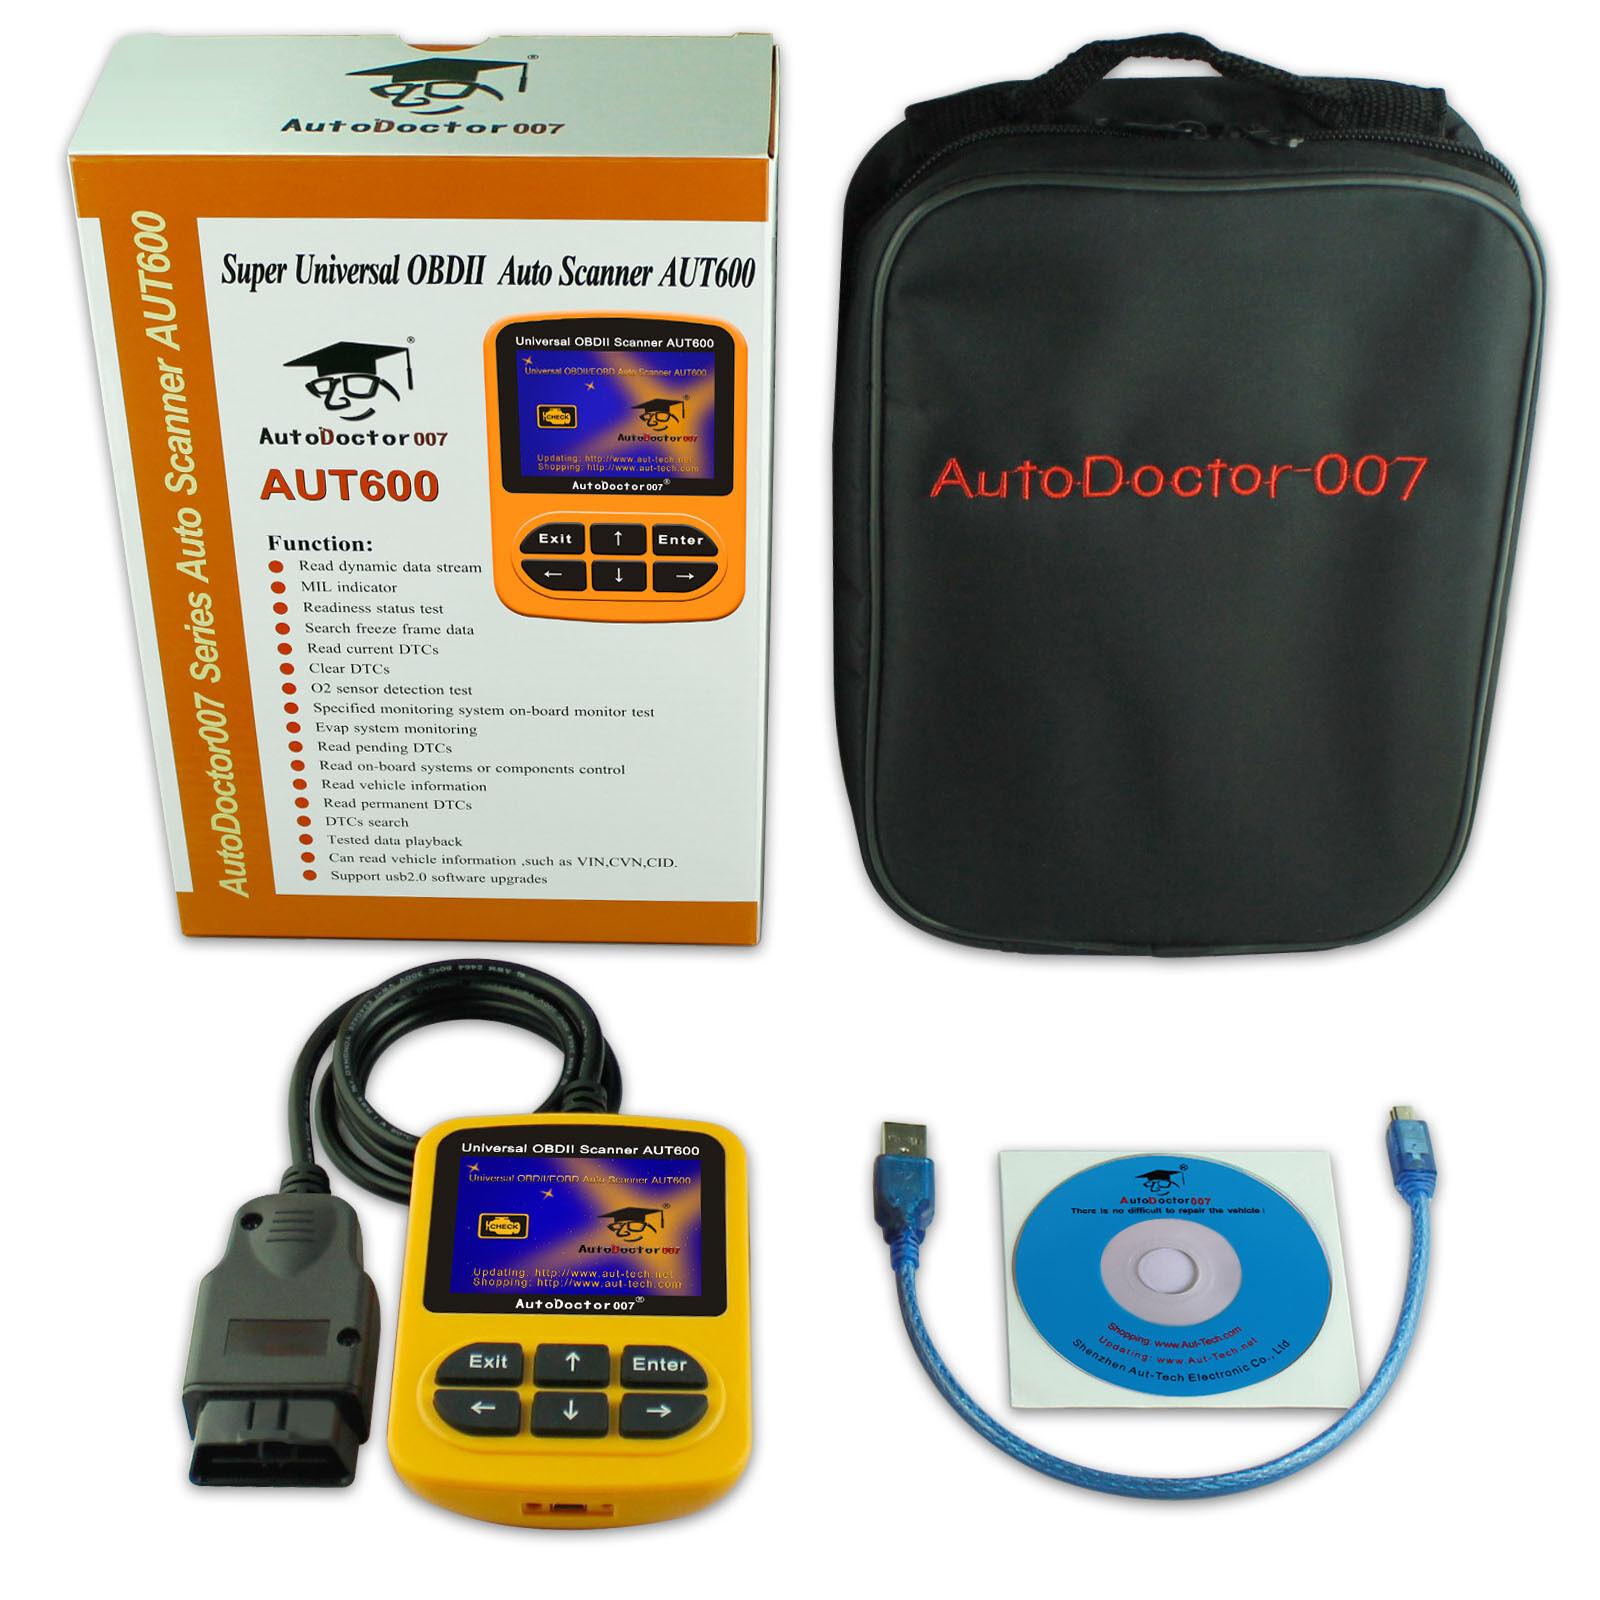 Brandnew Universal AutoDoctor007 AUT600 Diagnostic Auto FORD CHEVROLET TOYOTA VW